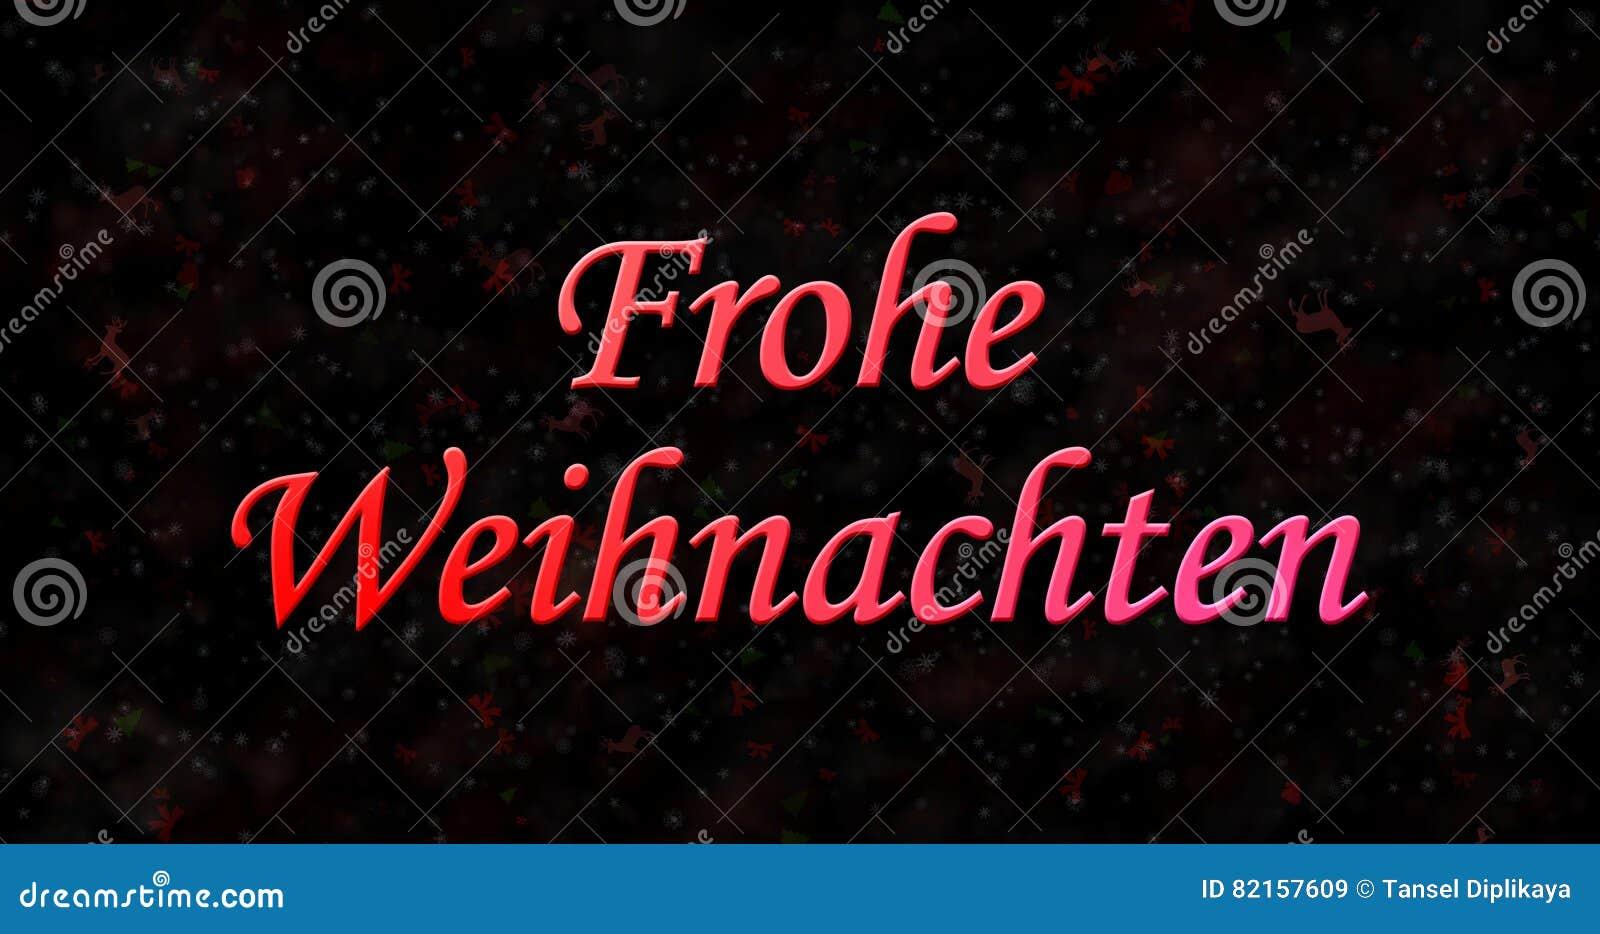 il buon natale manda un sms a in tedesco frohe weihnachten. Black Bedroom Furniture Sets. Home Design Ideas